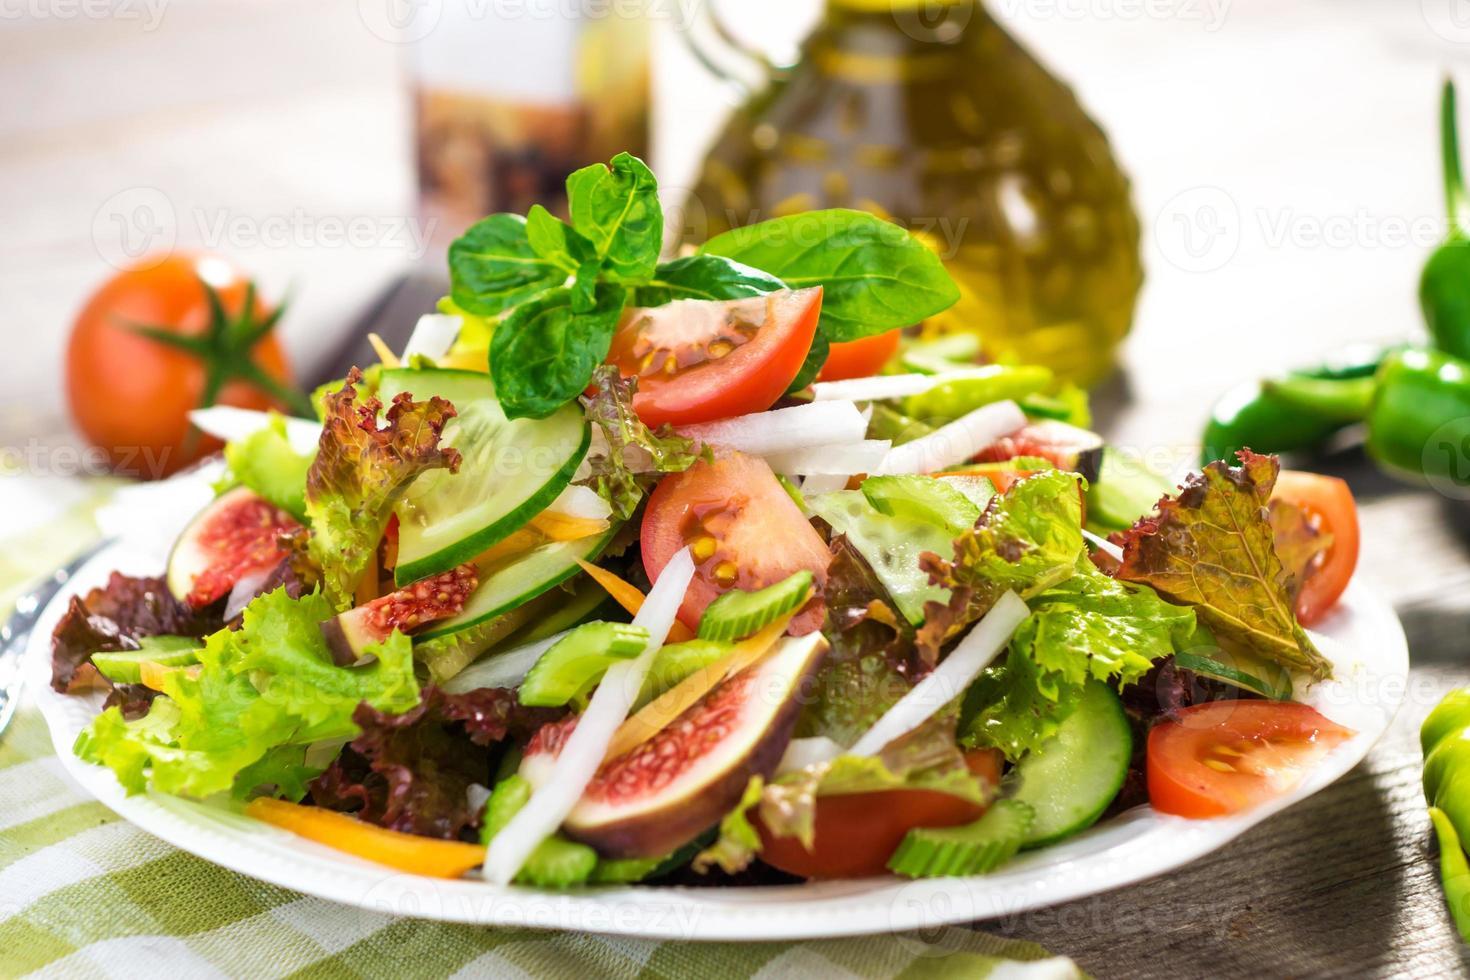 insalata fresca sana foto